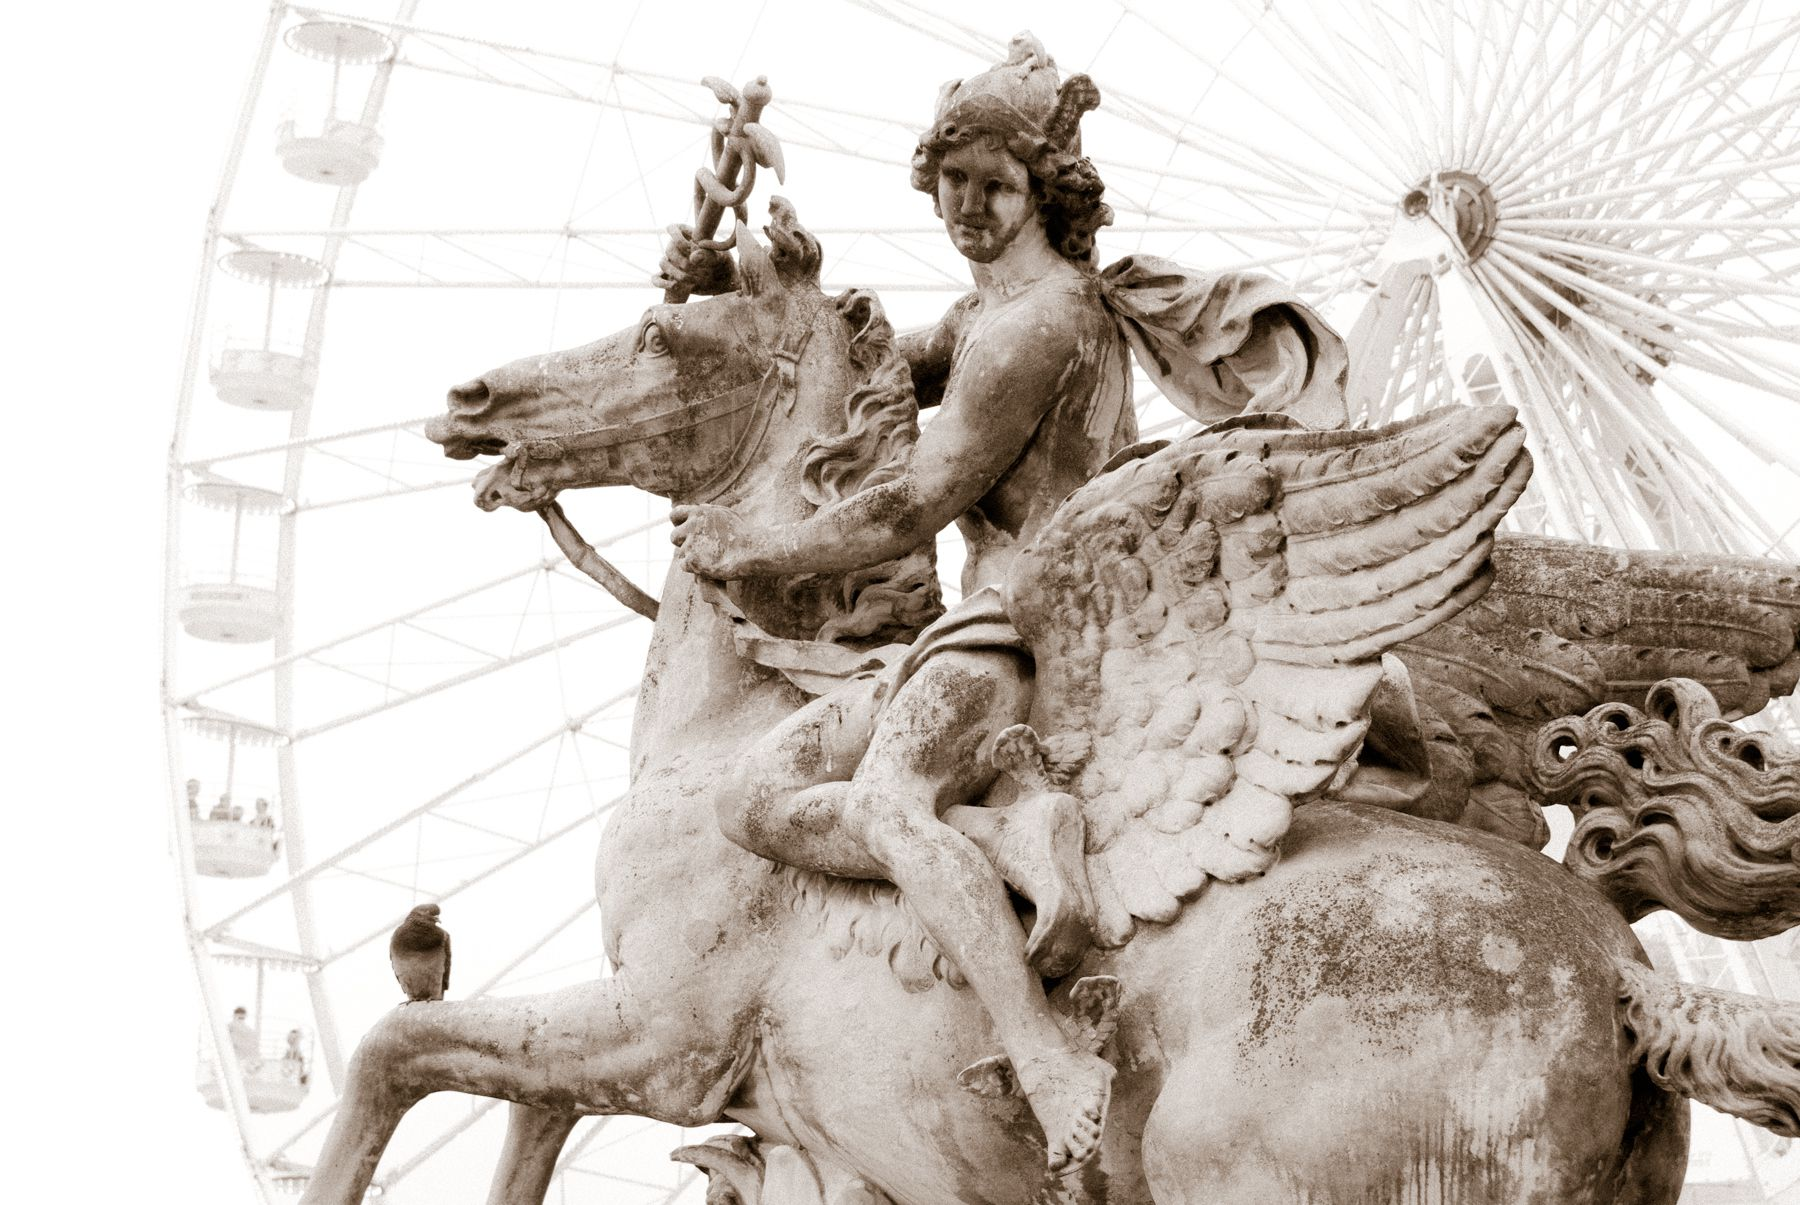 fast facts on the winged horse of greek mythology